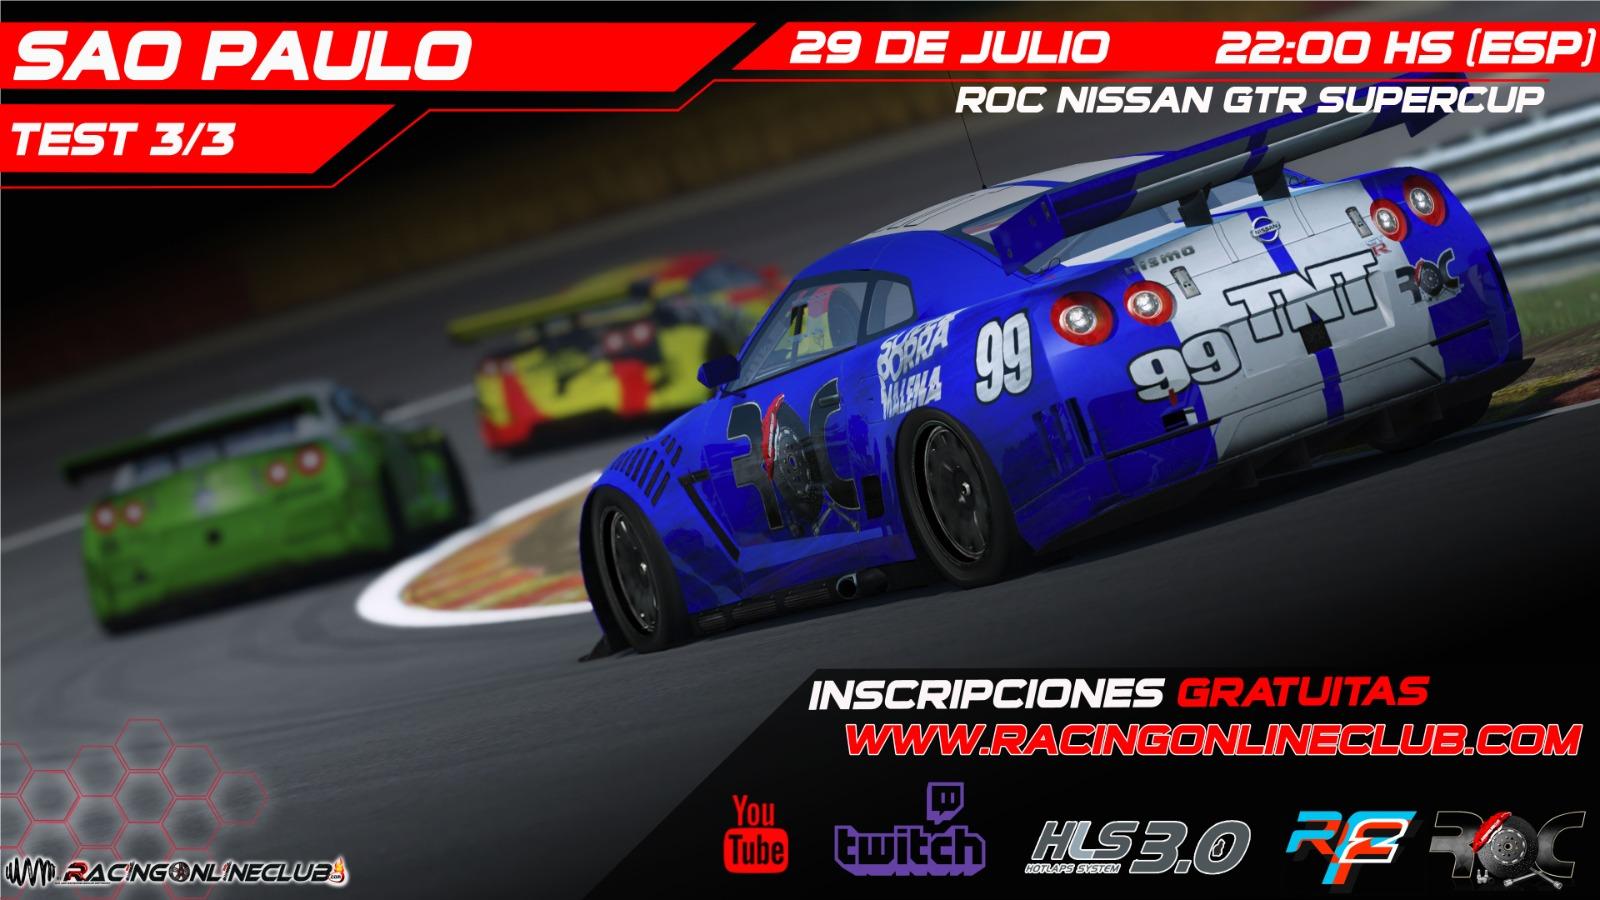 Nissan GTR SuperCup - Sao Paulo